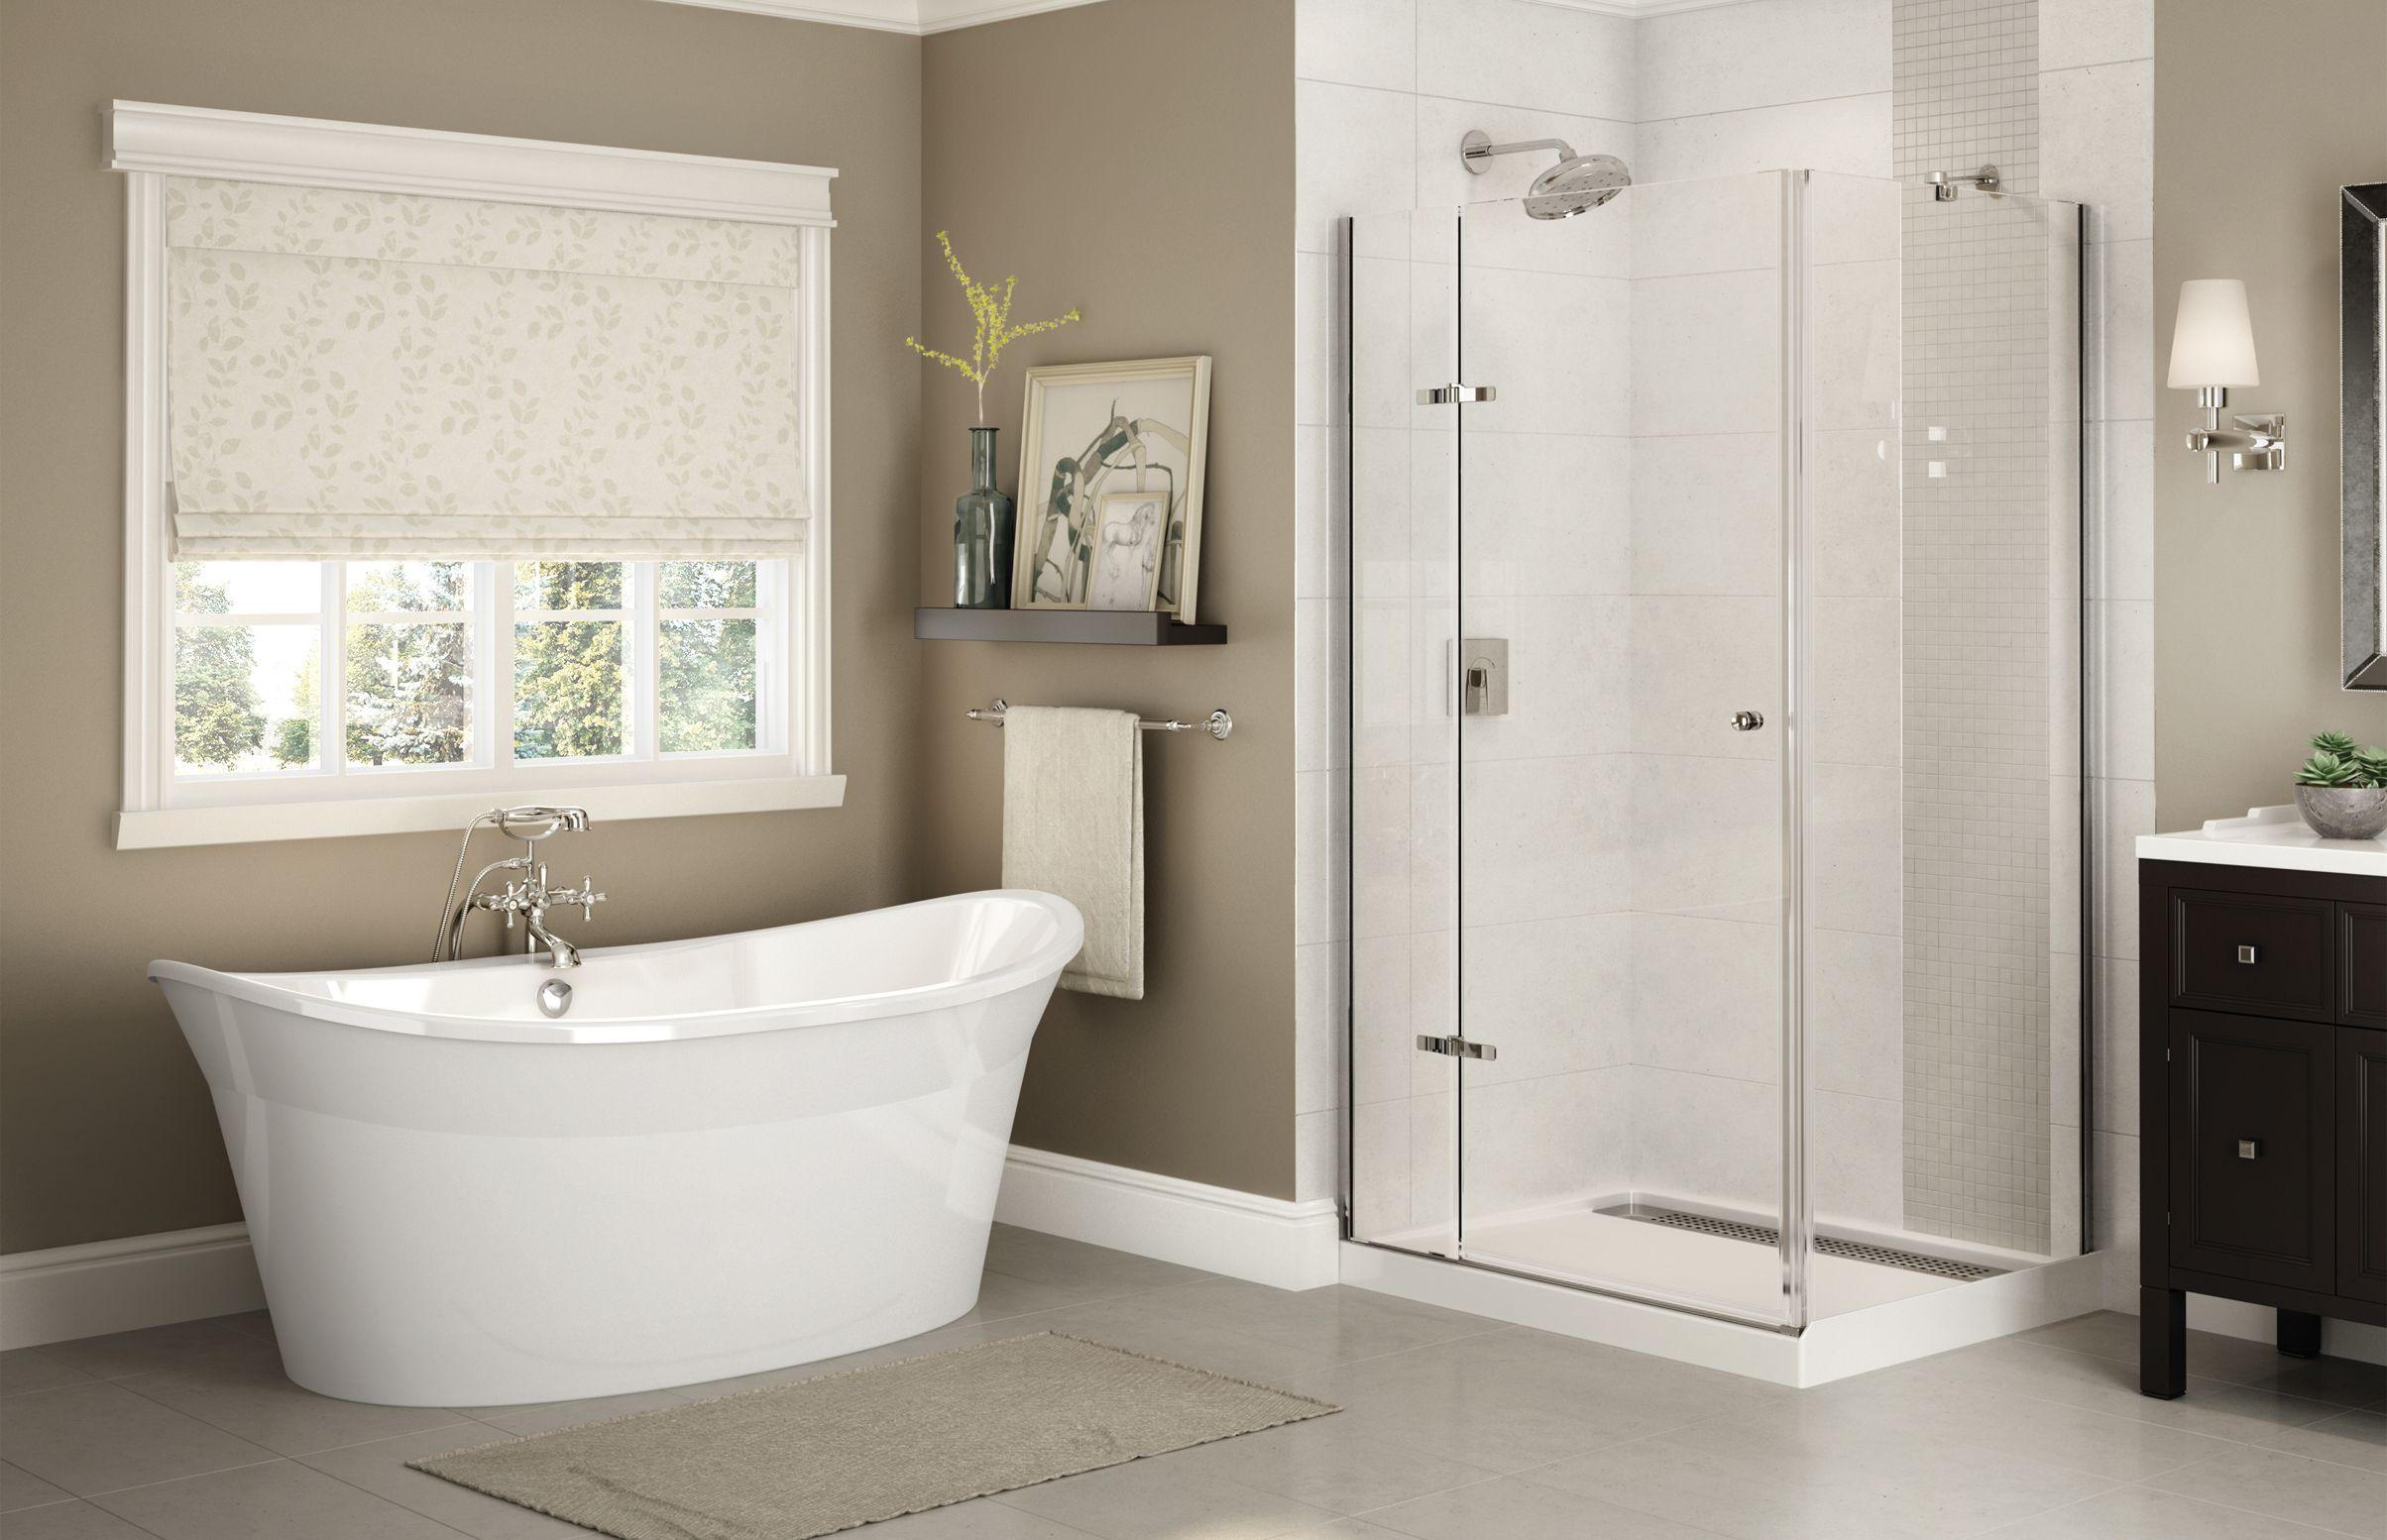 Orchestra 6032 | Maison | Pinterest | Bath, Bathtubs and House